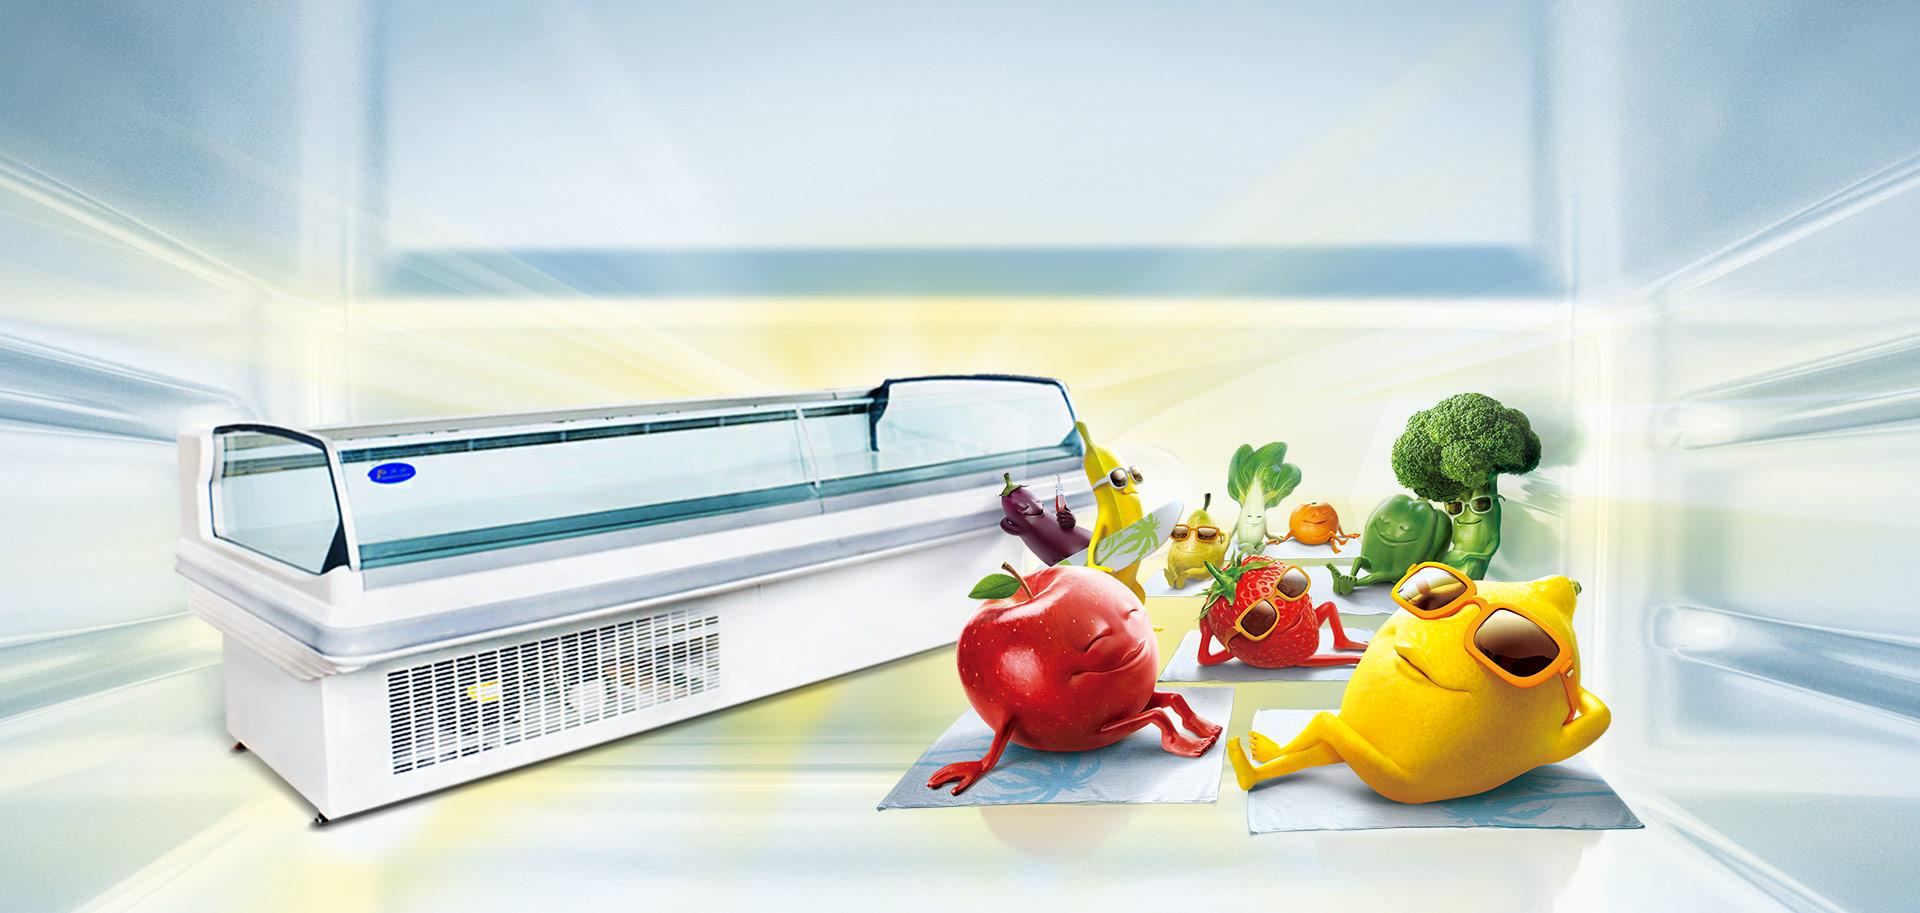 dusung butchery refrigerator